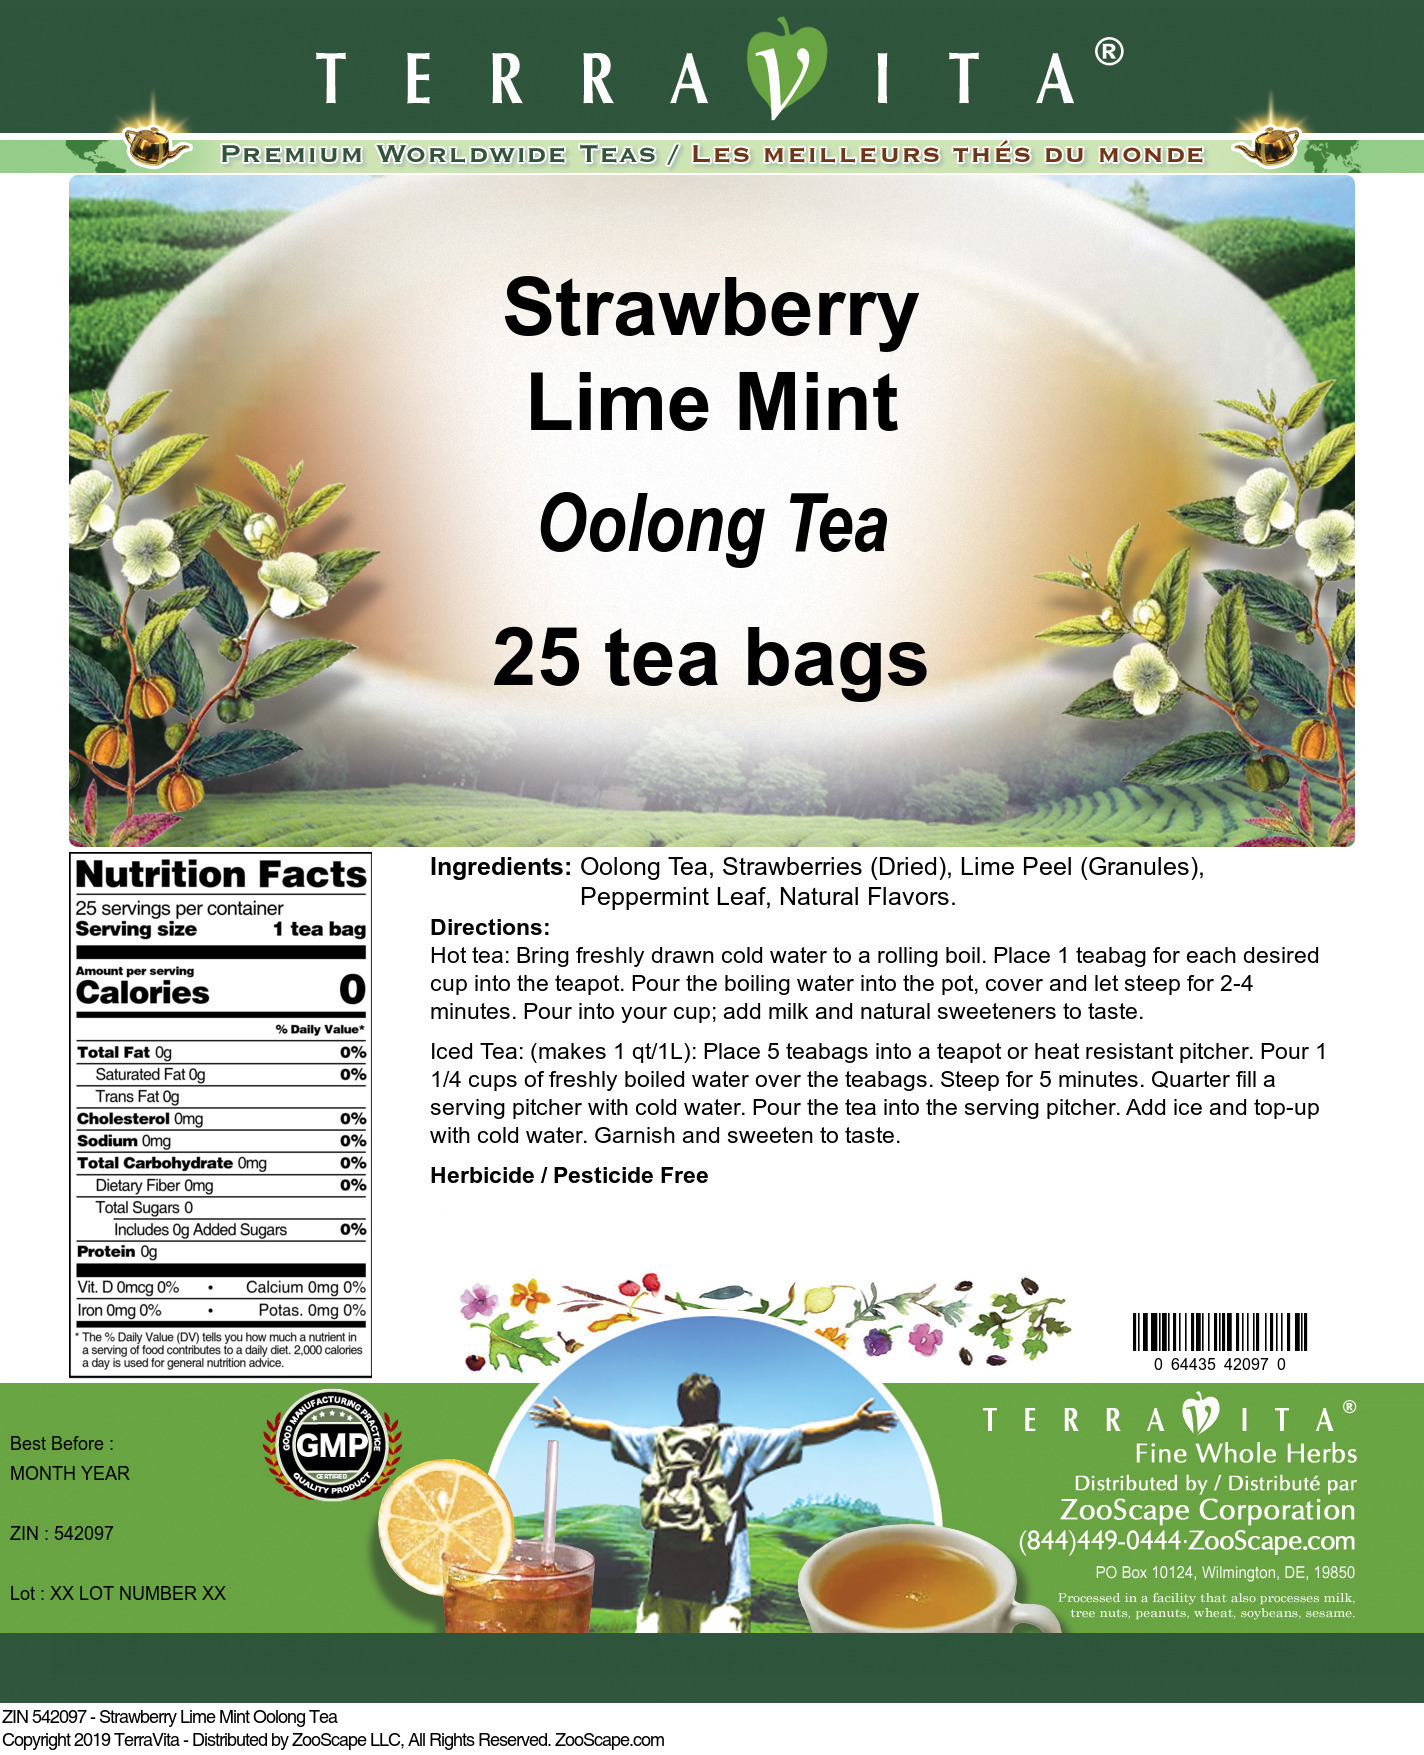 Strawberry Lime Mint Oolong Tea